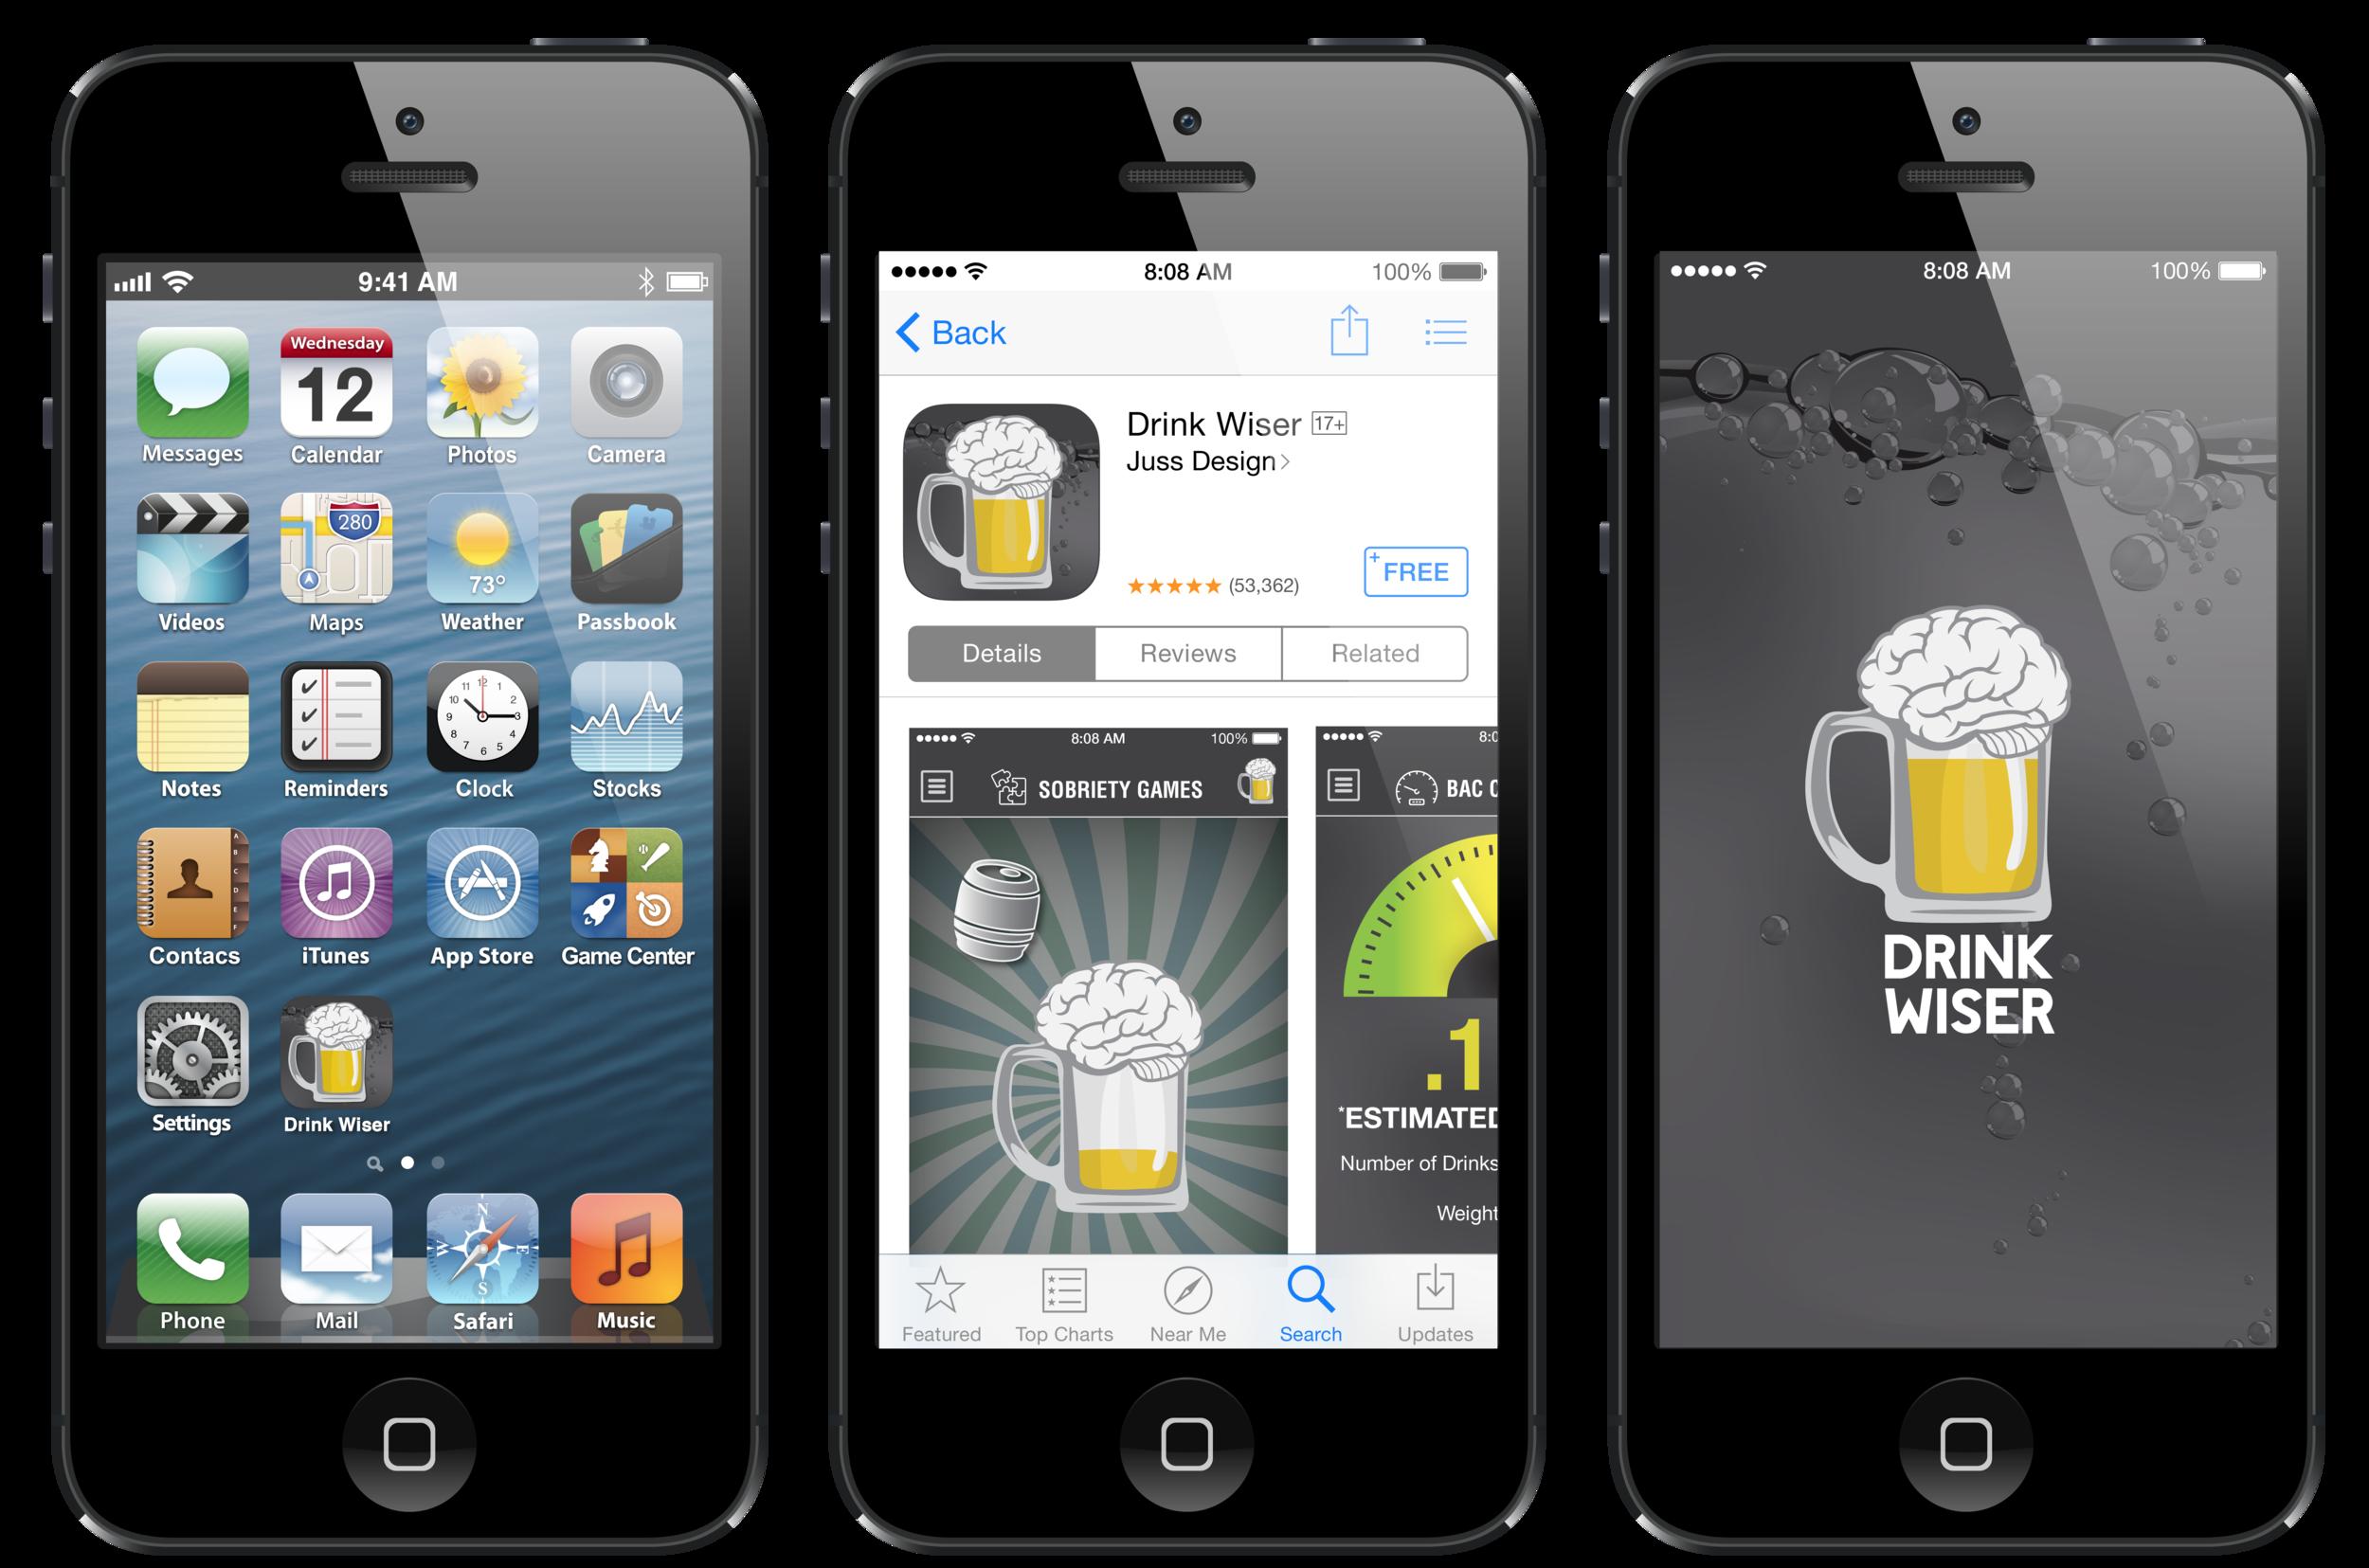 App Icon, App Download Page, Splash Screen